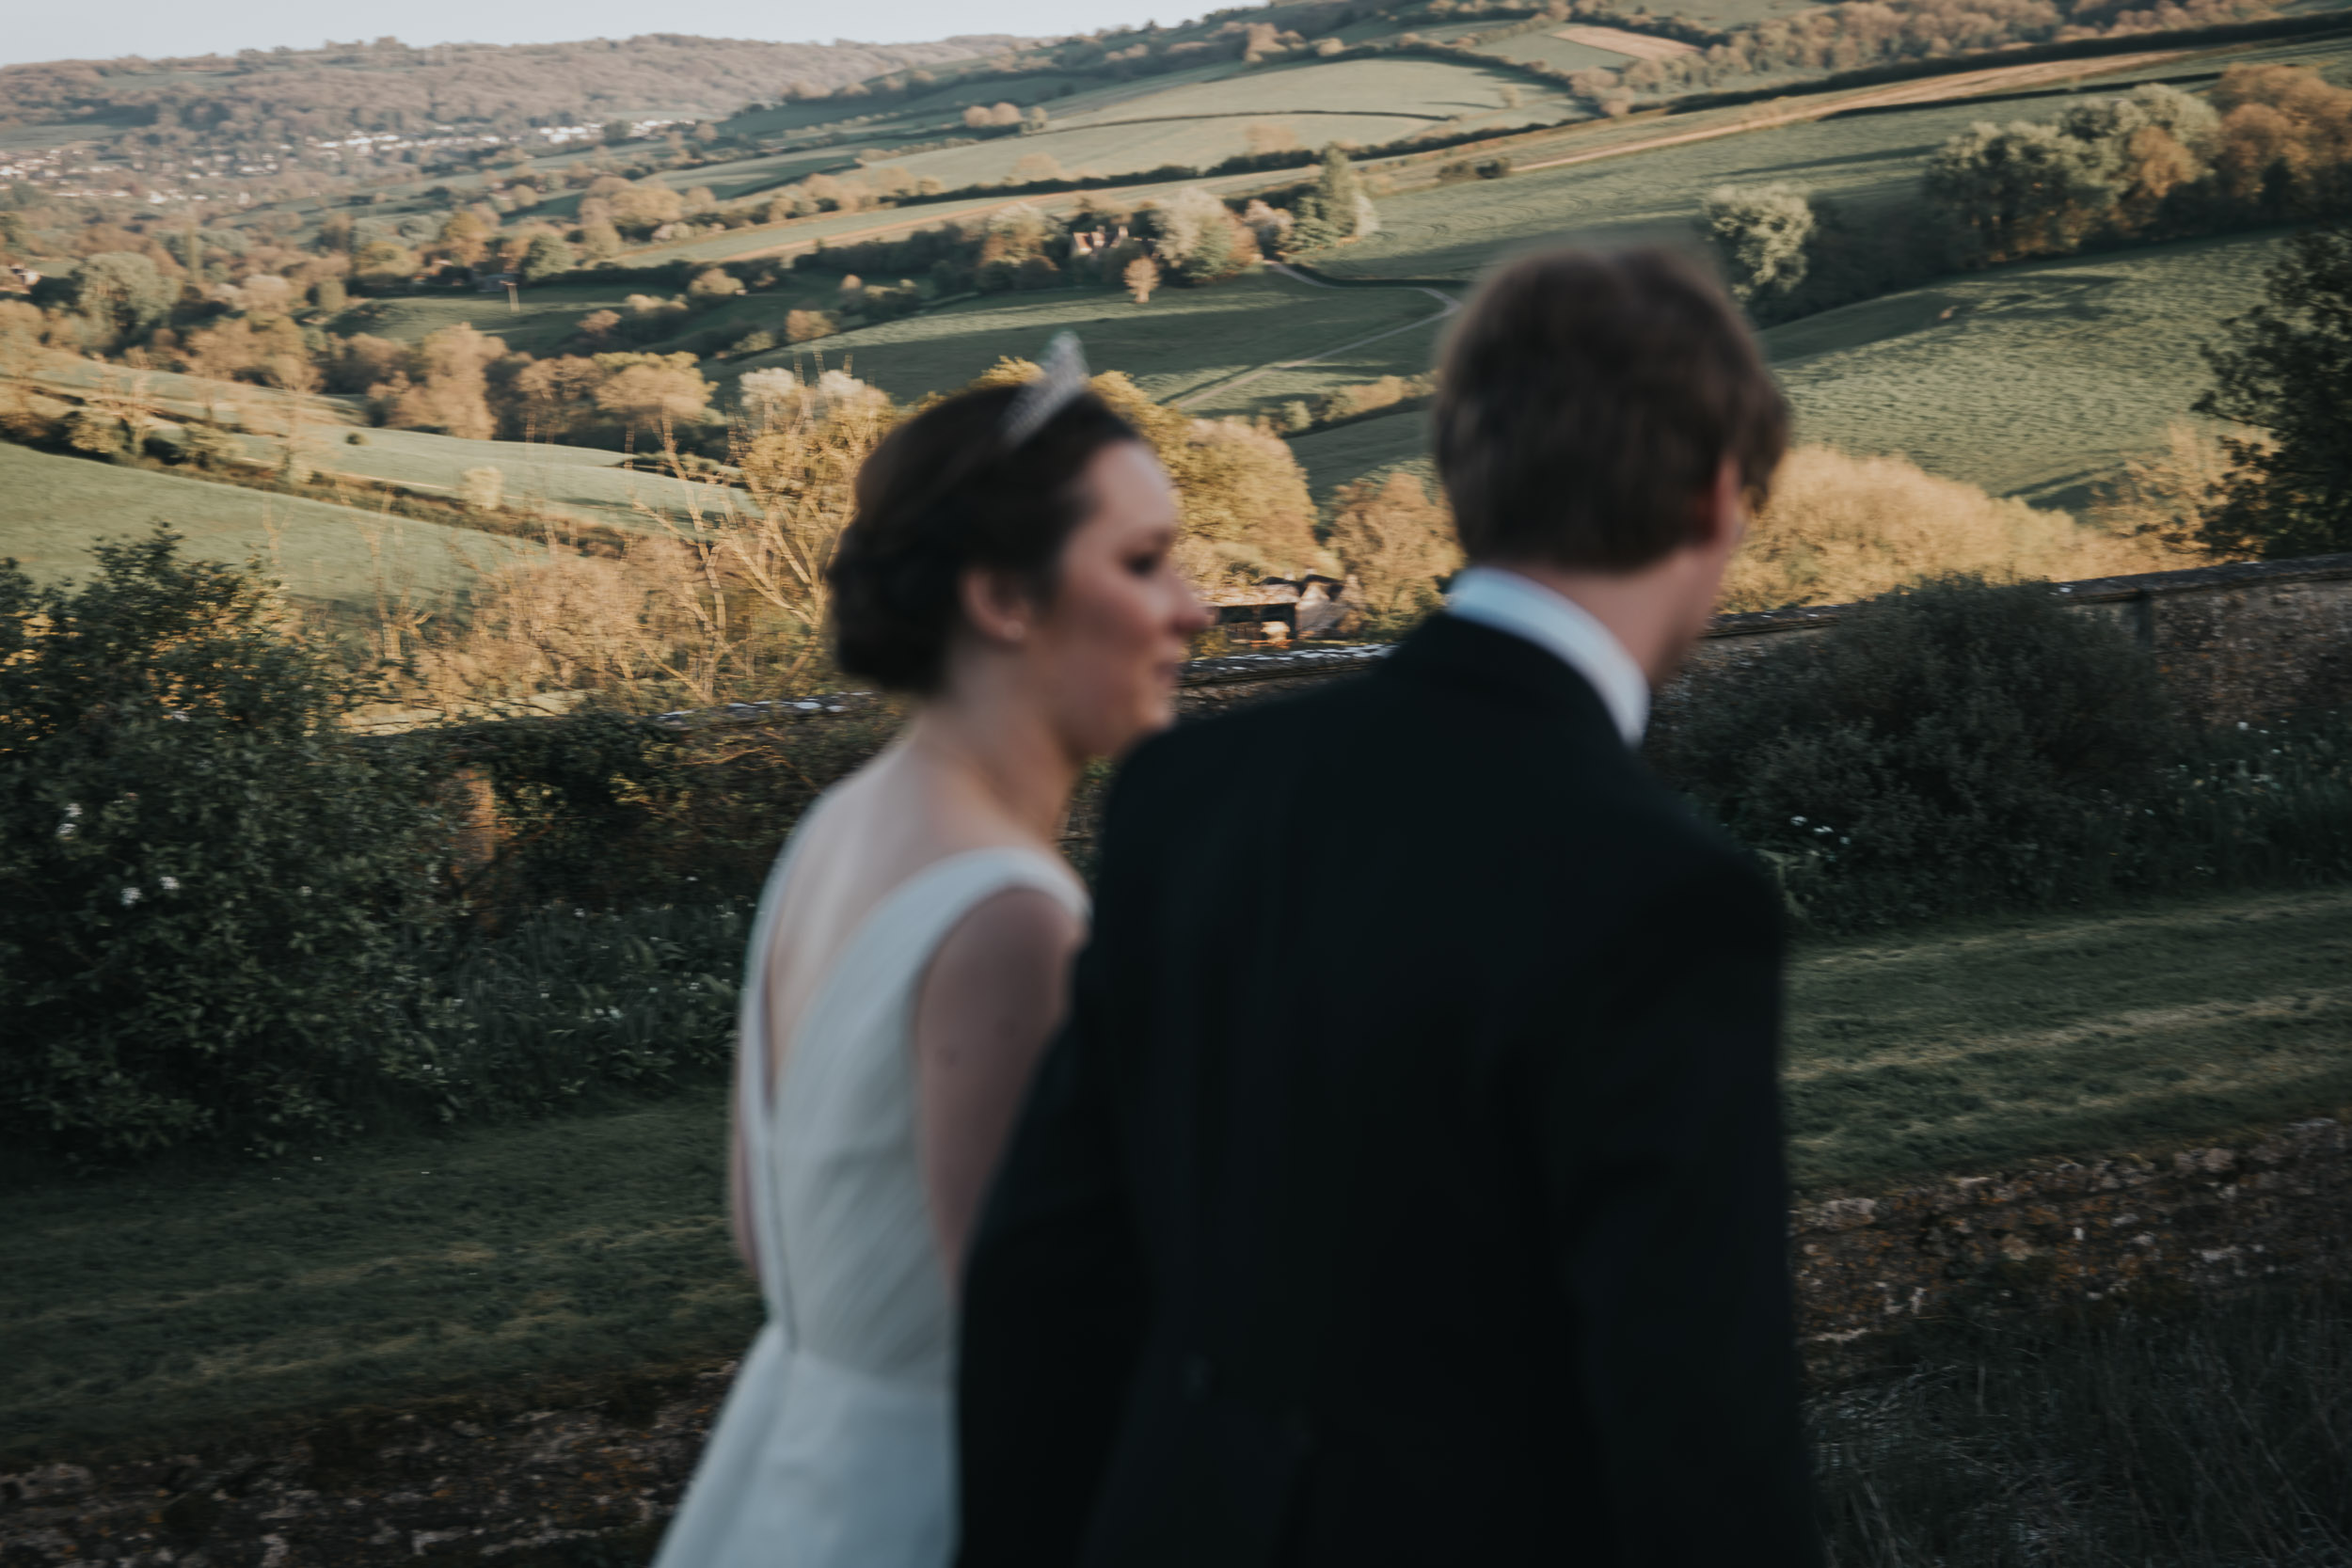 hamswell-house-wedding-photographer-w107.jpg